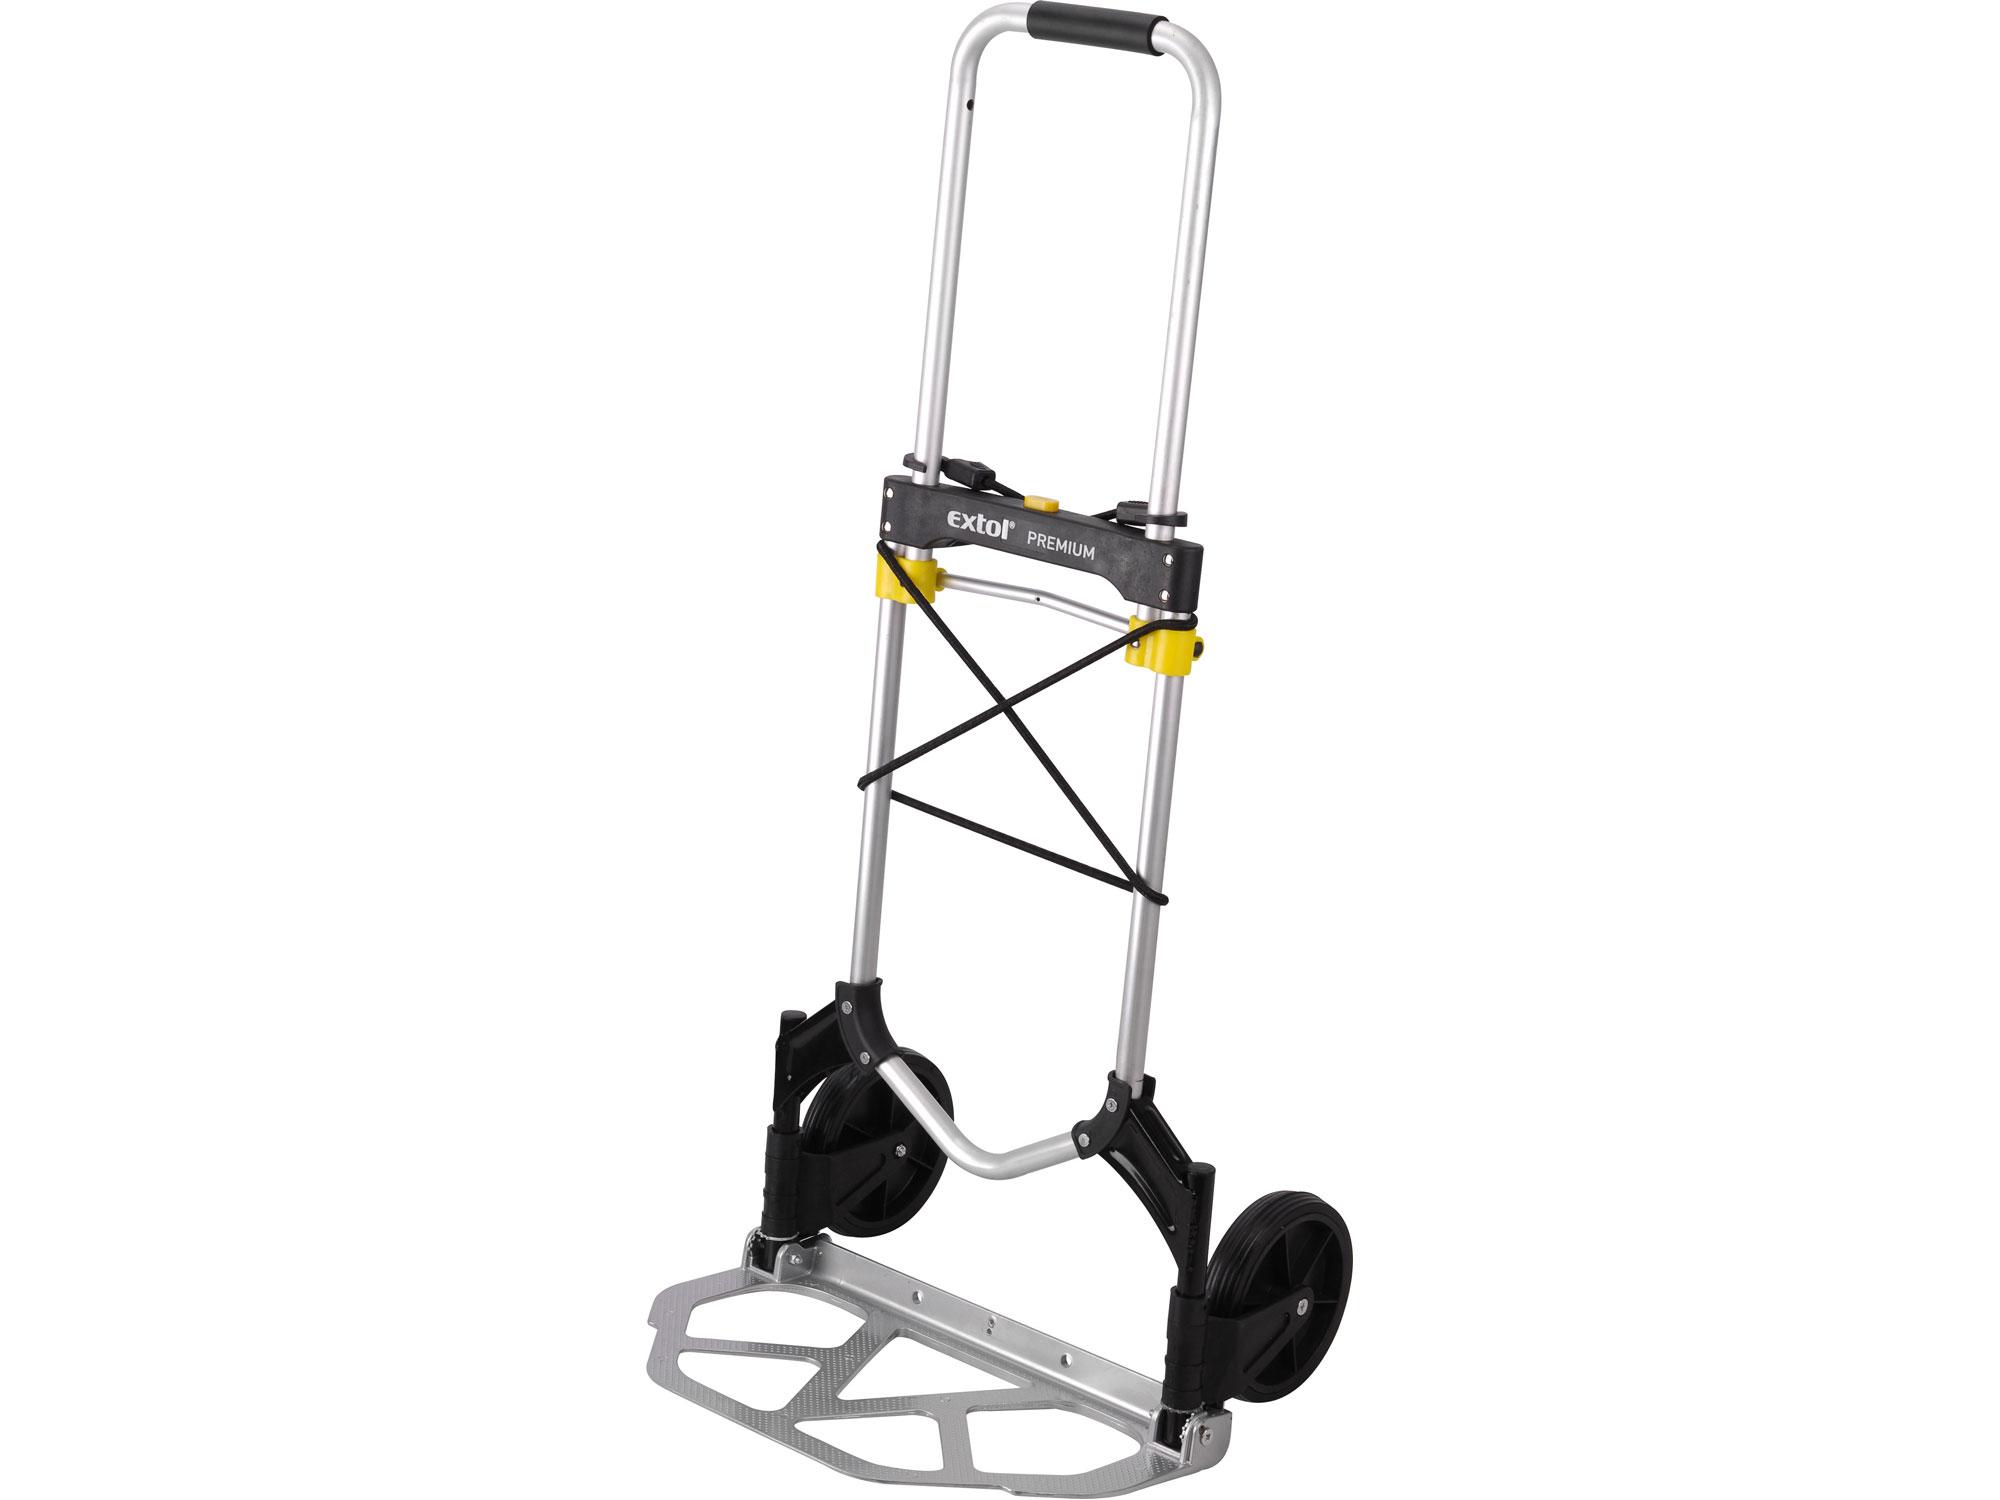 Vozík-rudl skládací EXTOL PREMIUM 8856000